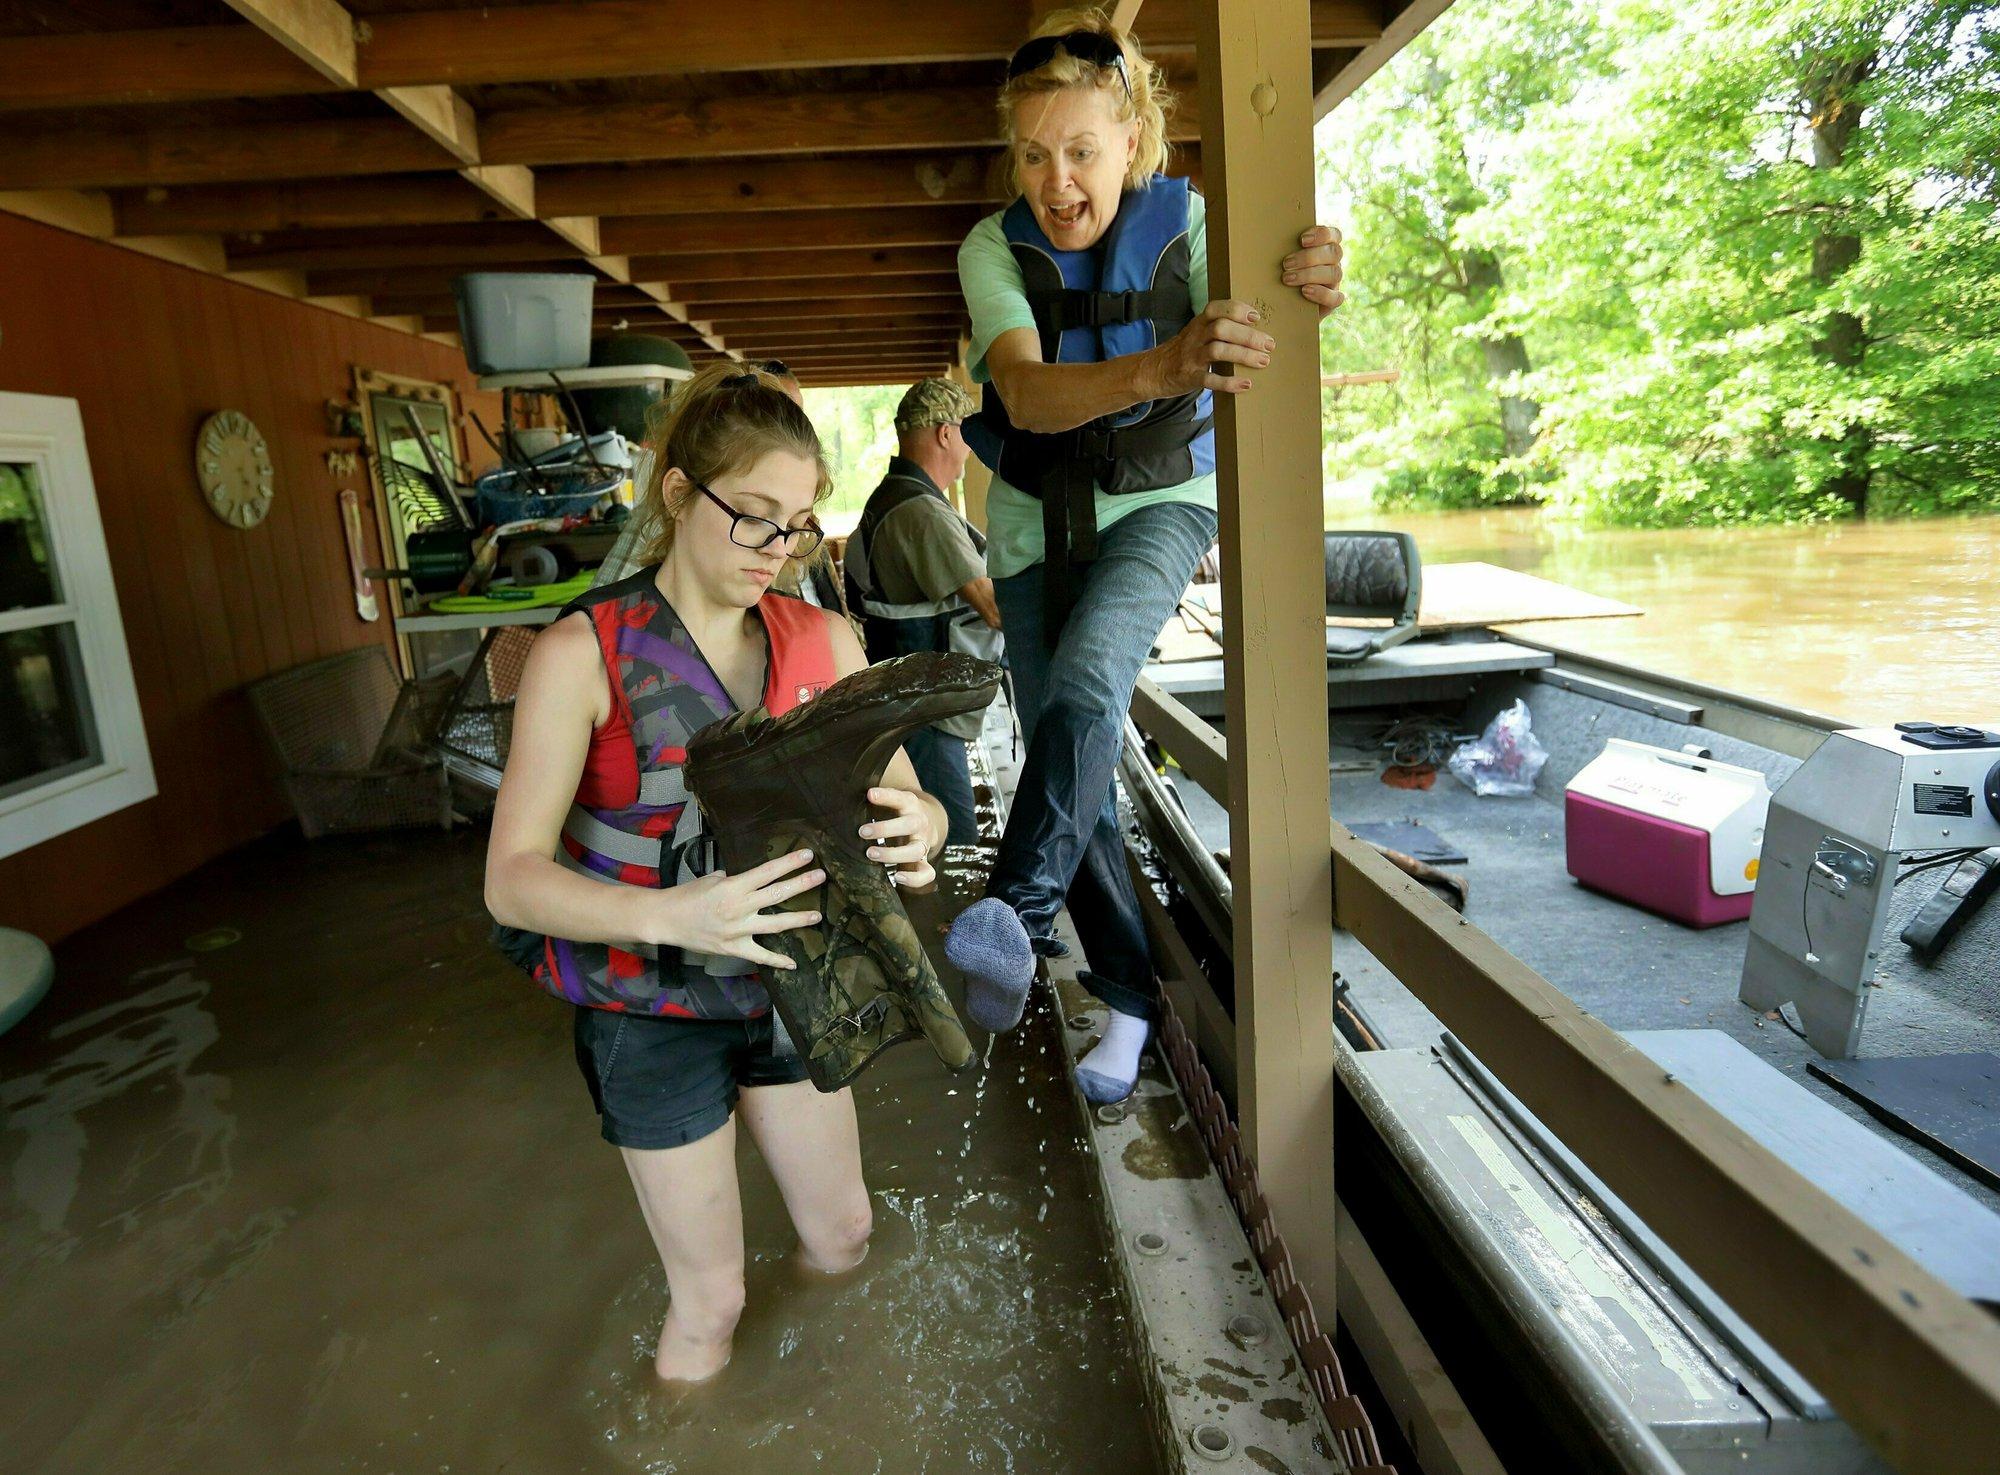 The Latest: Mike Pence to visit flood-damaged Oklahoma